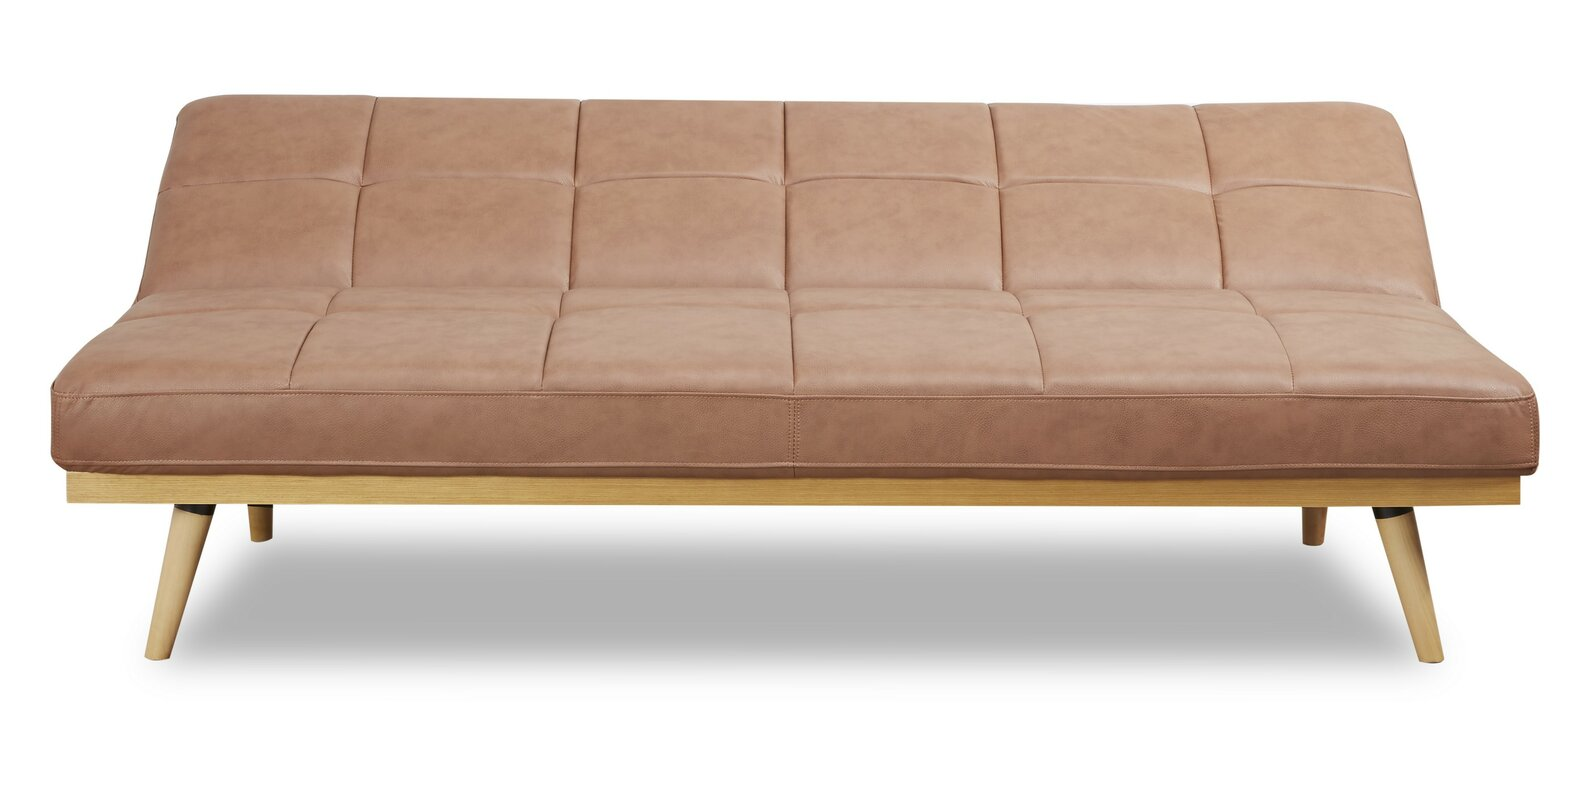 leader lifestyle 3 sitzer schlafsofa malo bewertungen. Black Bedroom Furniture Sets. Home Design Ideas